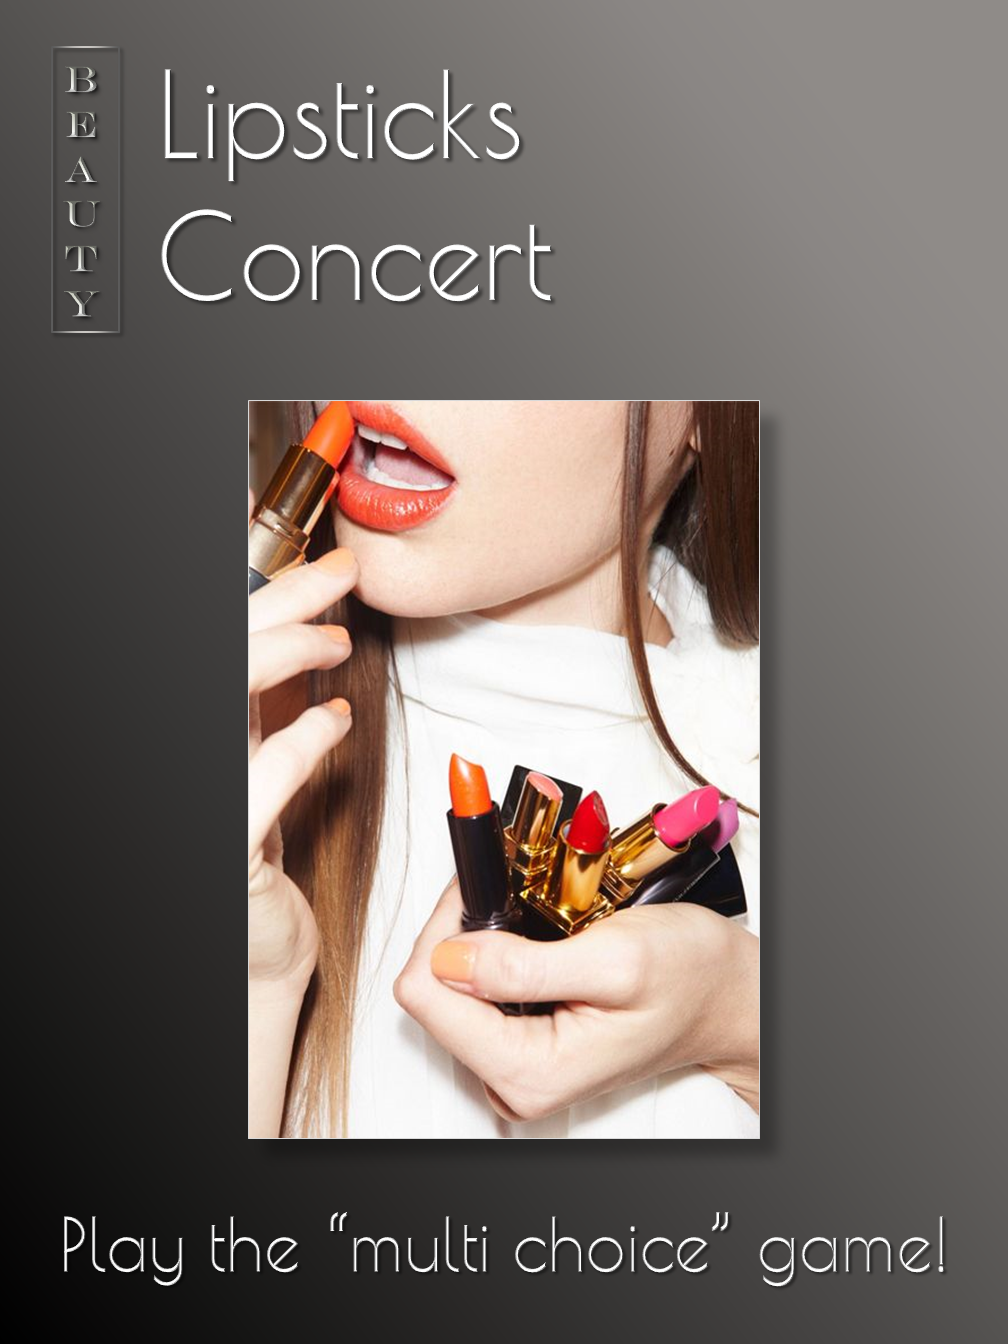 Lipsticks Concert